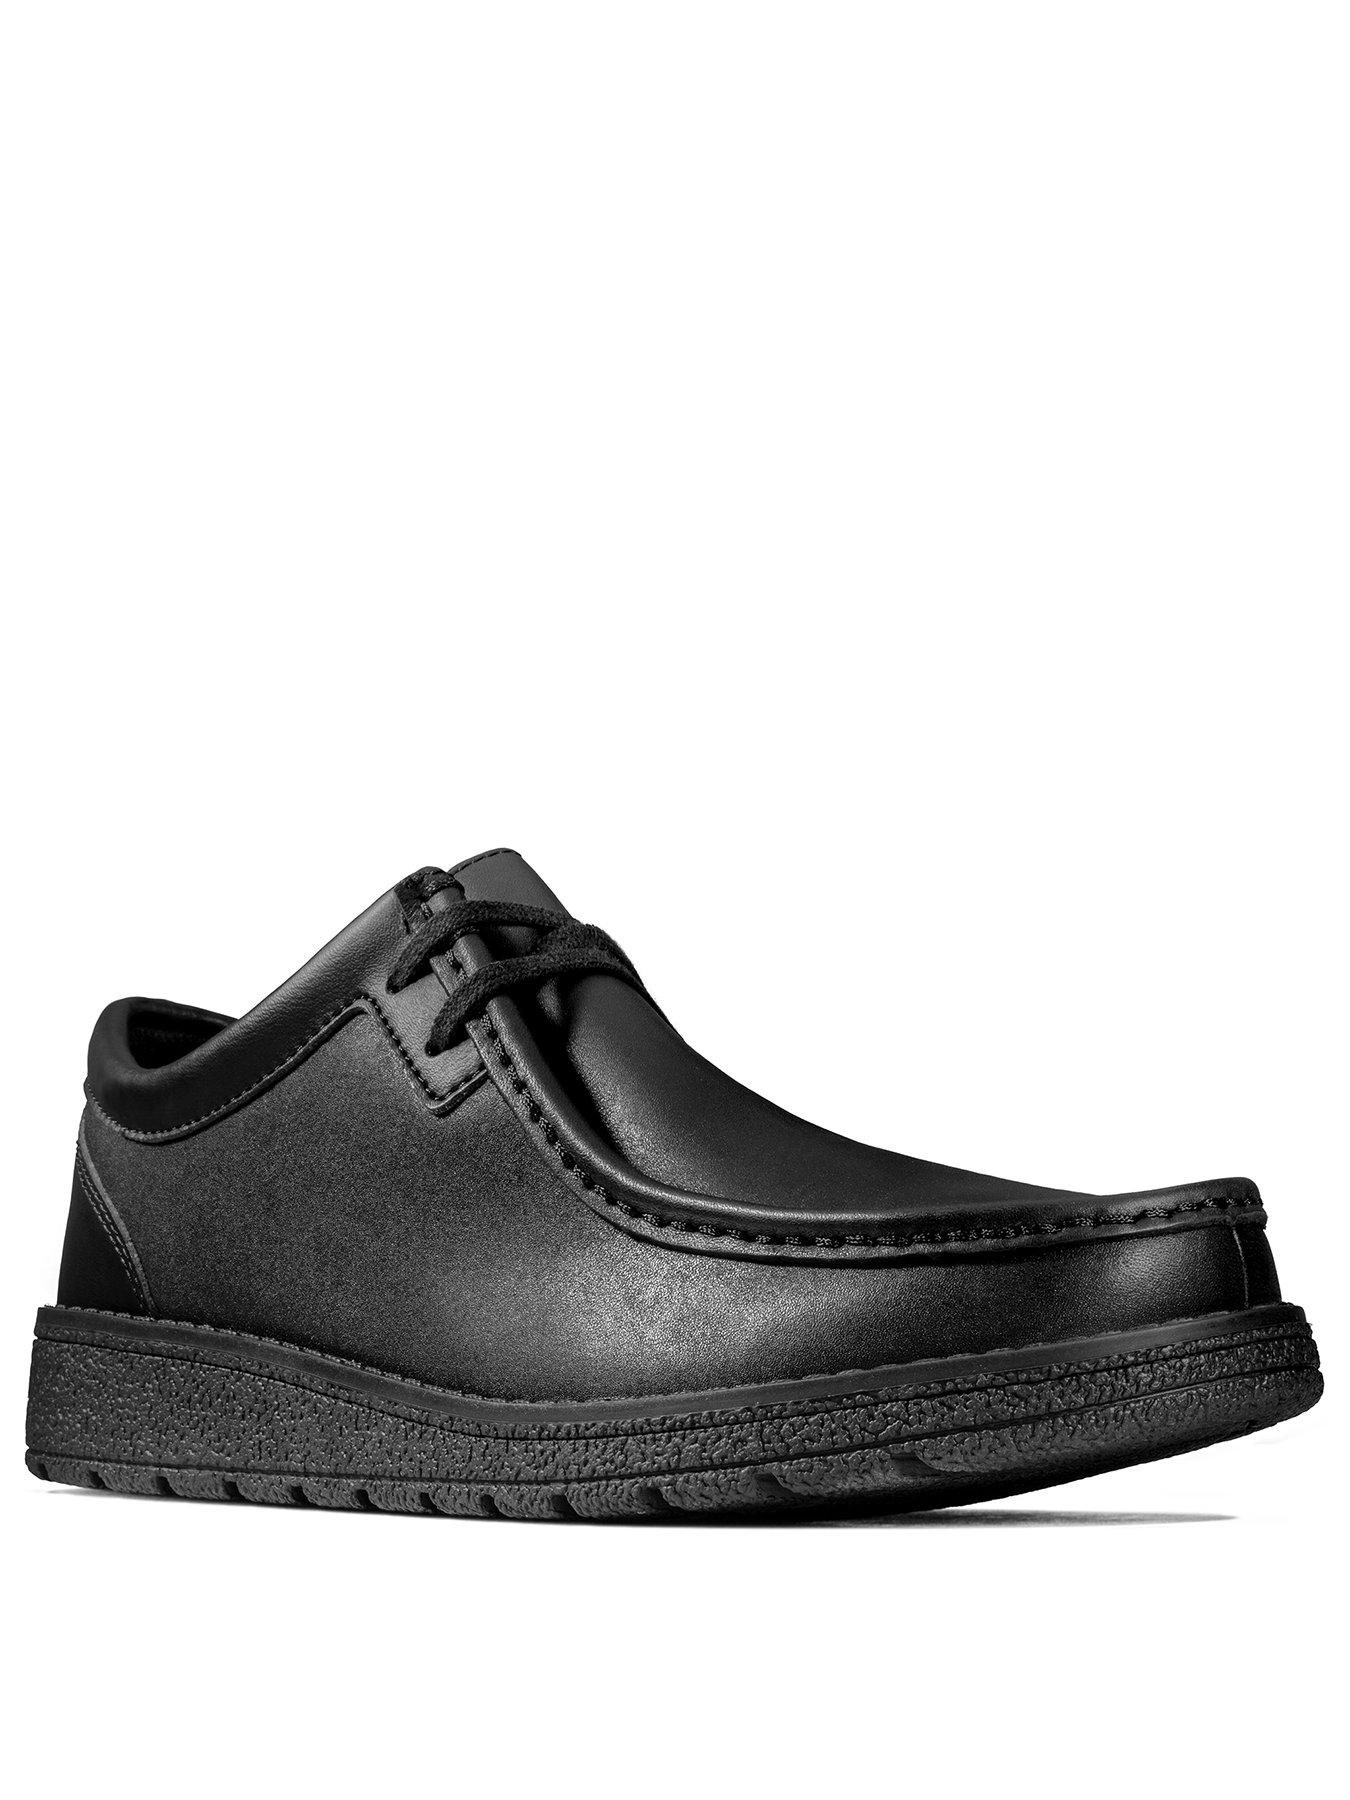 41 Best Clarks Kids Shoes images